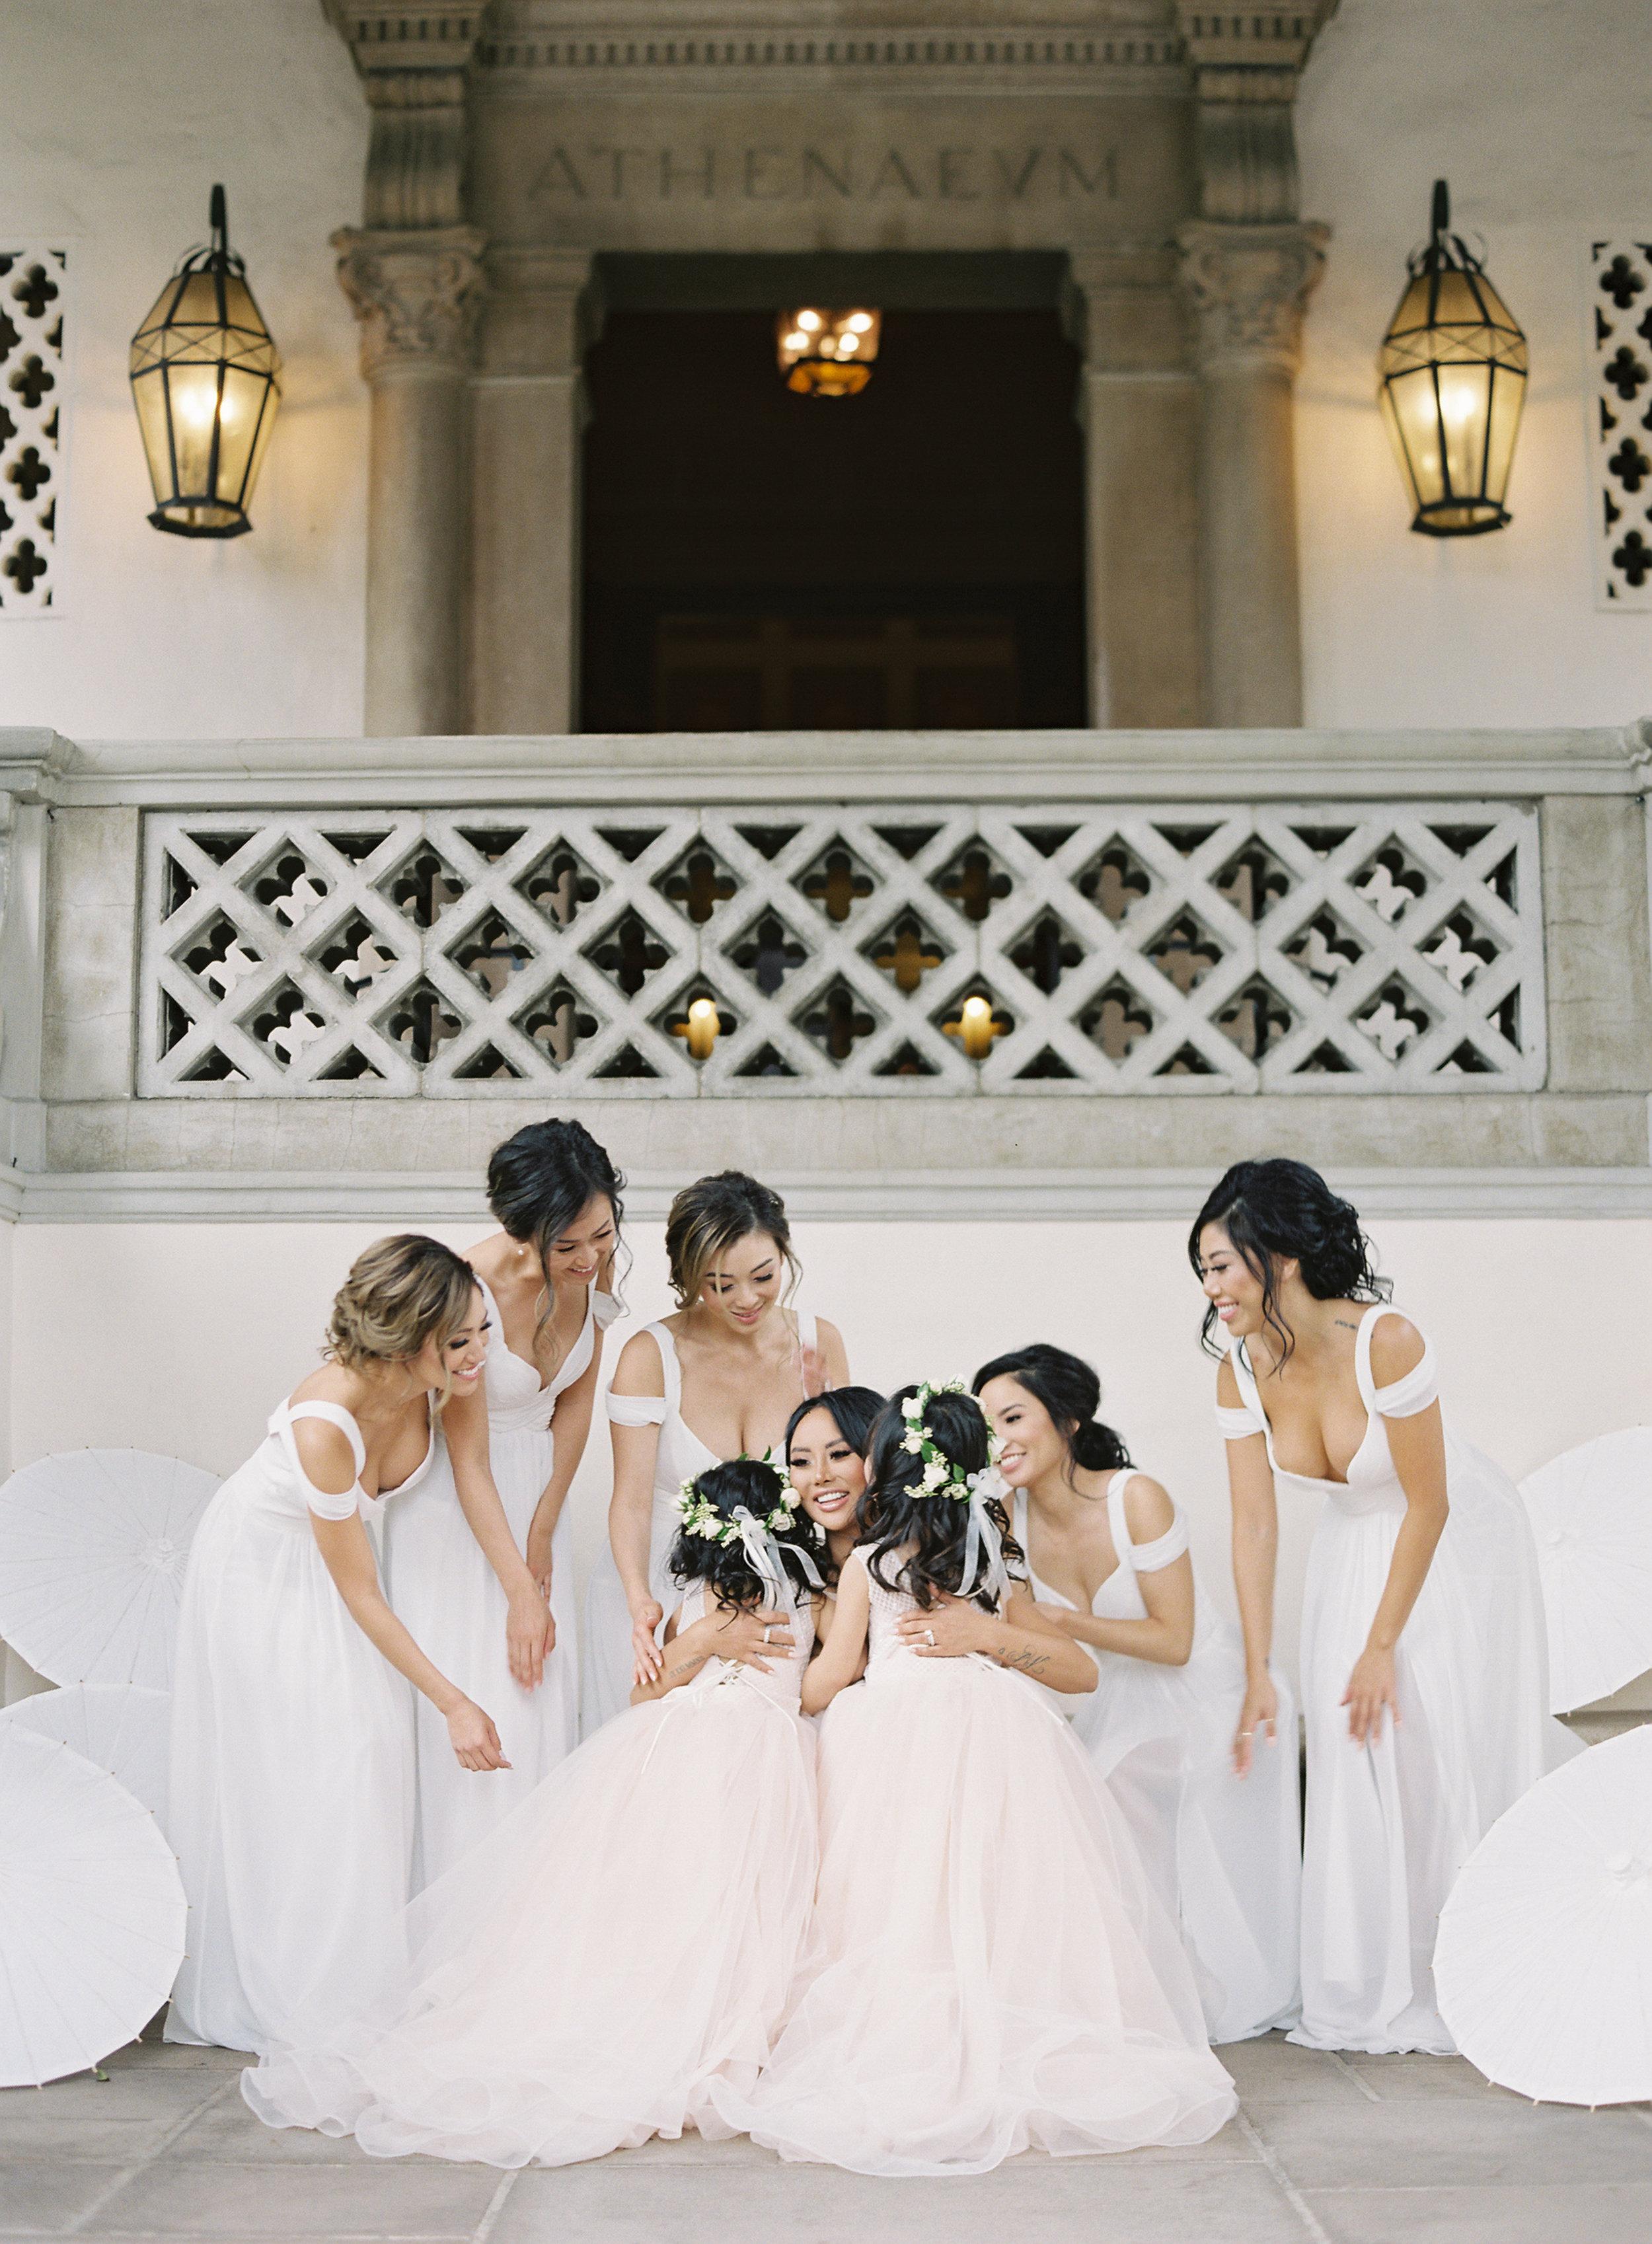 Athenaeum_Wedding_Hi_Res-16-Jen_Huang-005199-R1-010.jpg